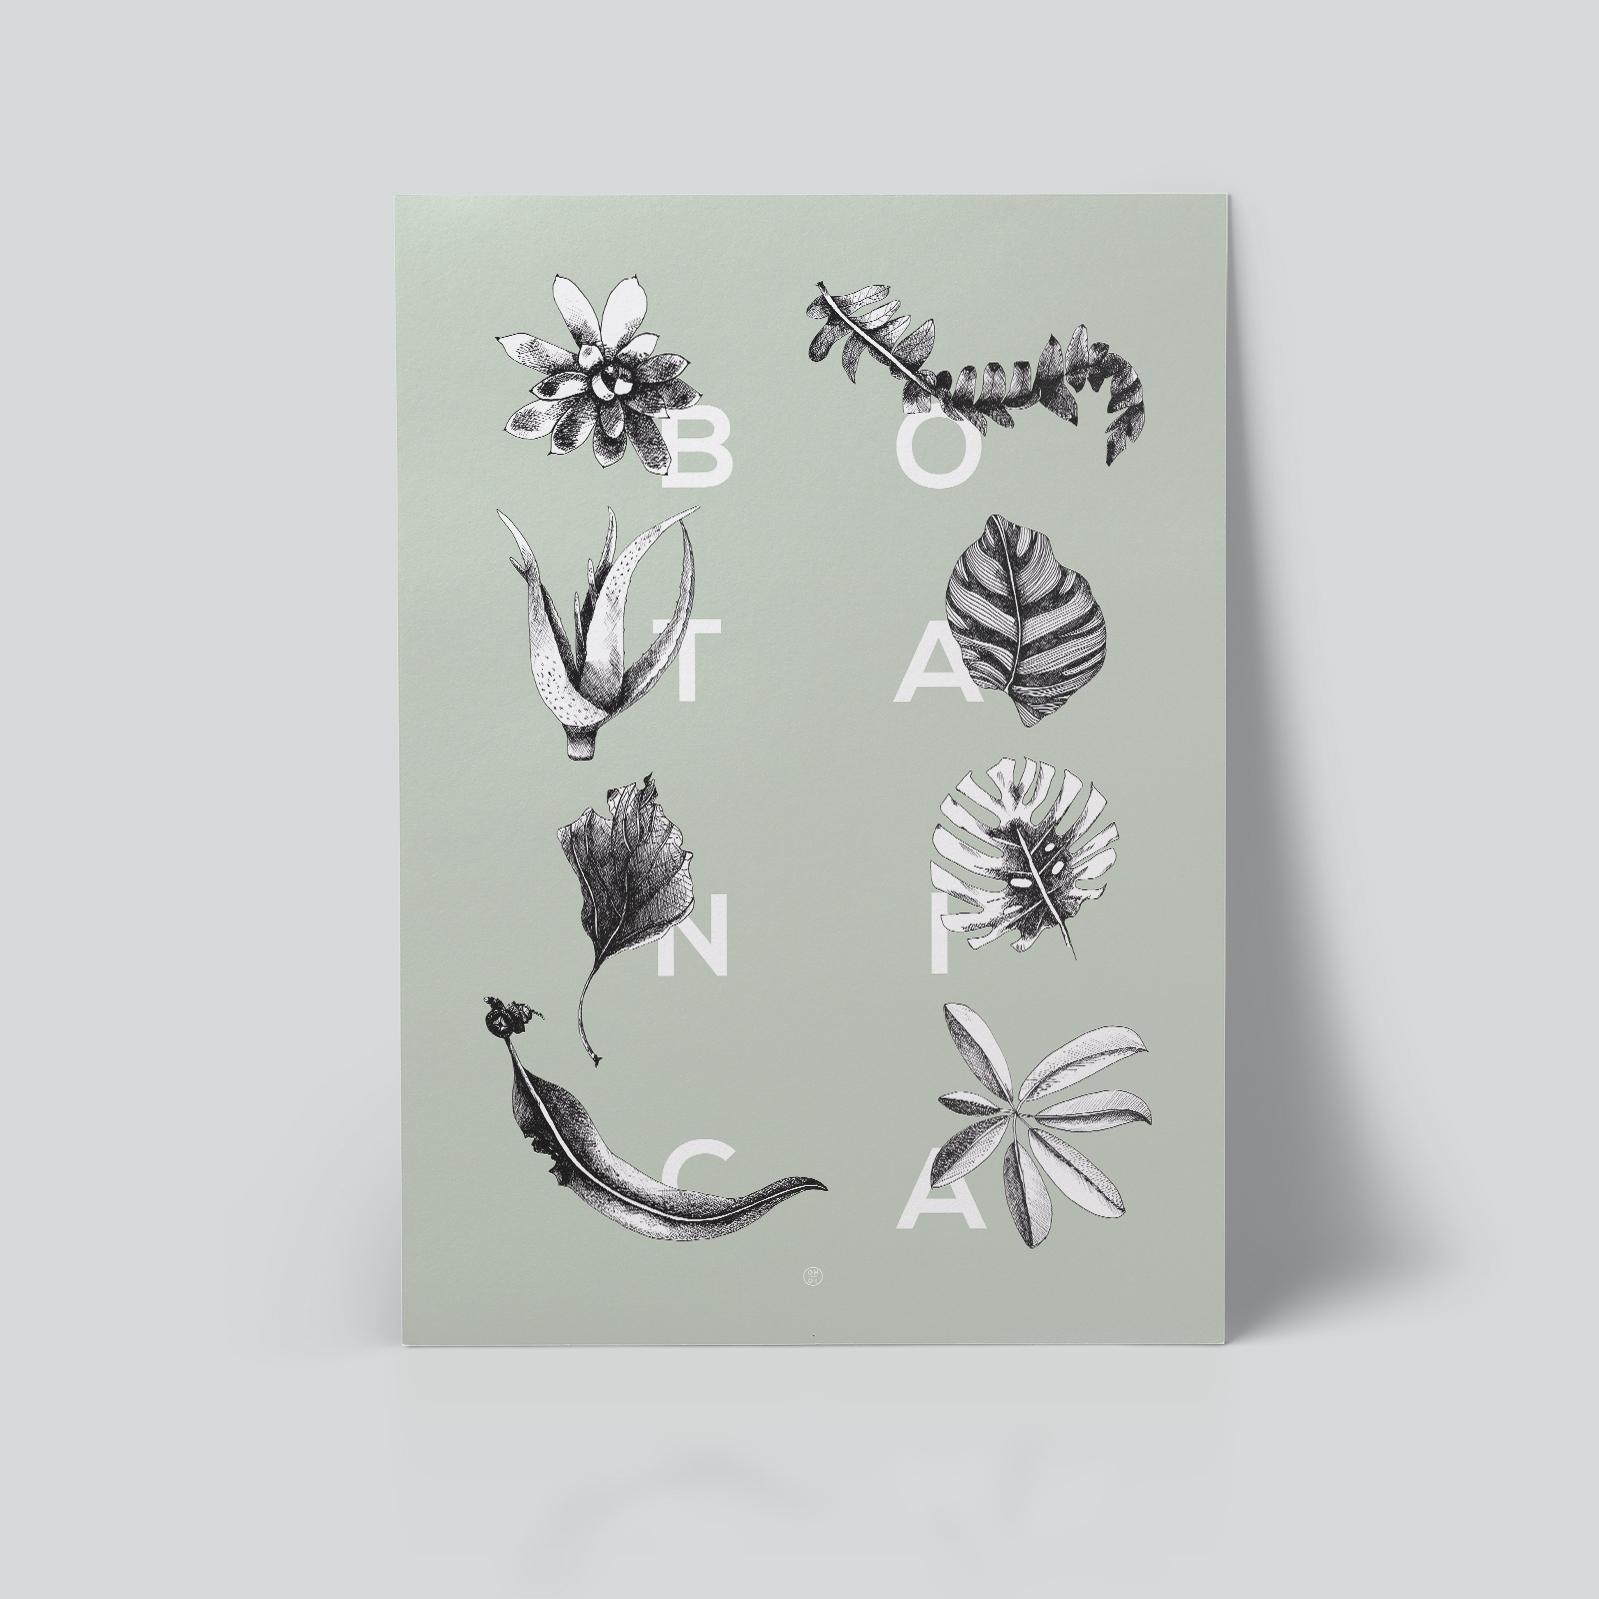 Botanica plakat Botanica letters mint botanisk ohoi studio